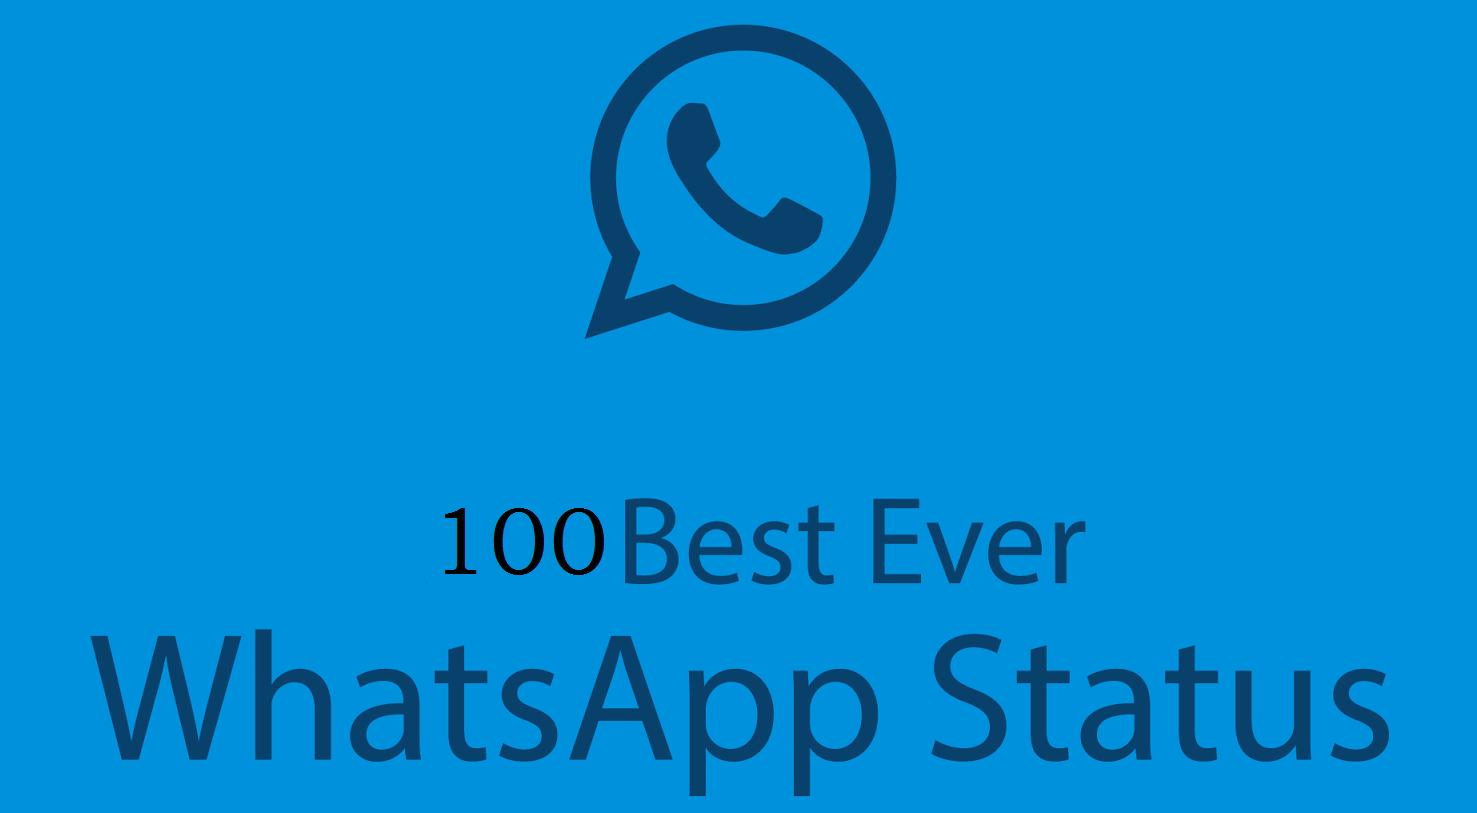 whatsapp best status quotes top 100 whatsapp status quotes